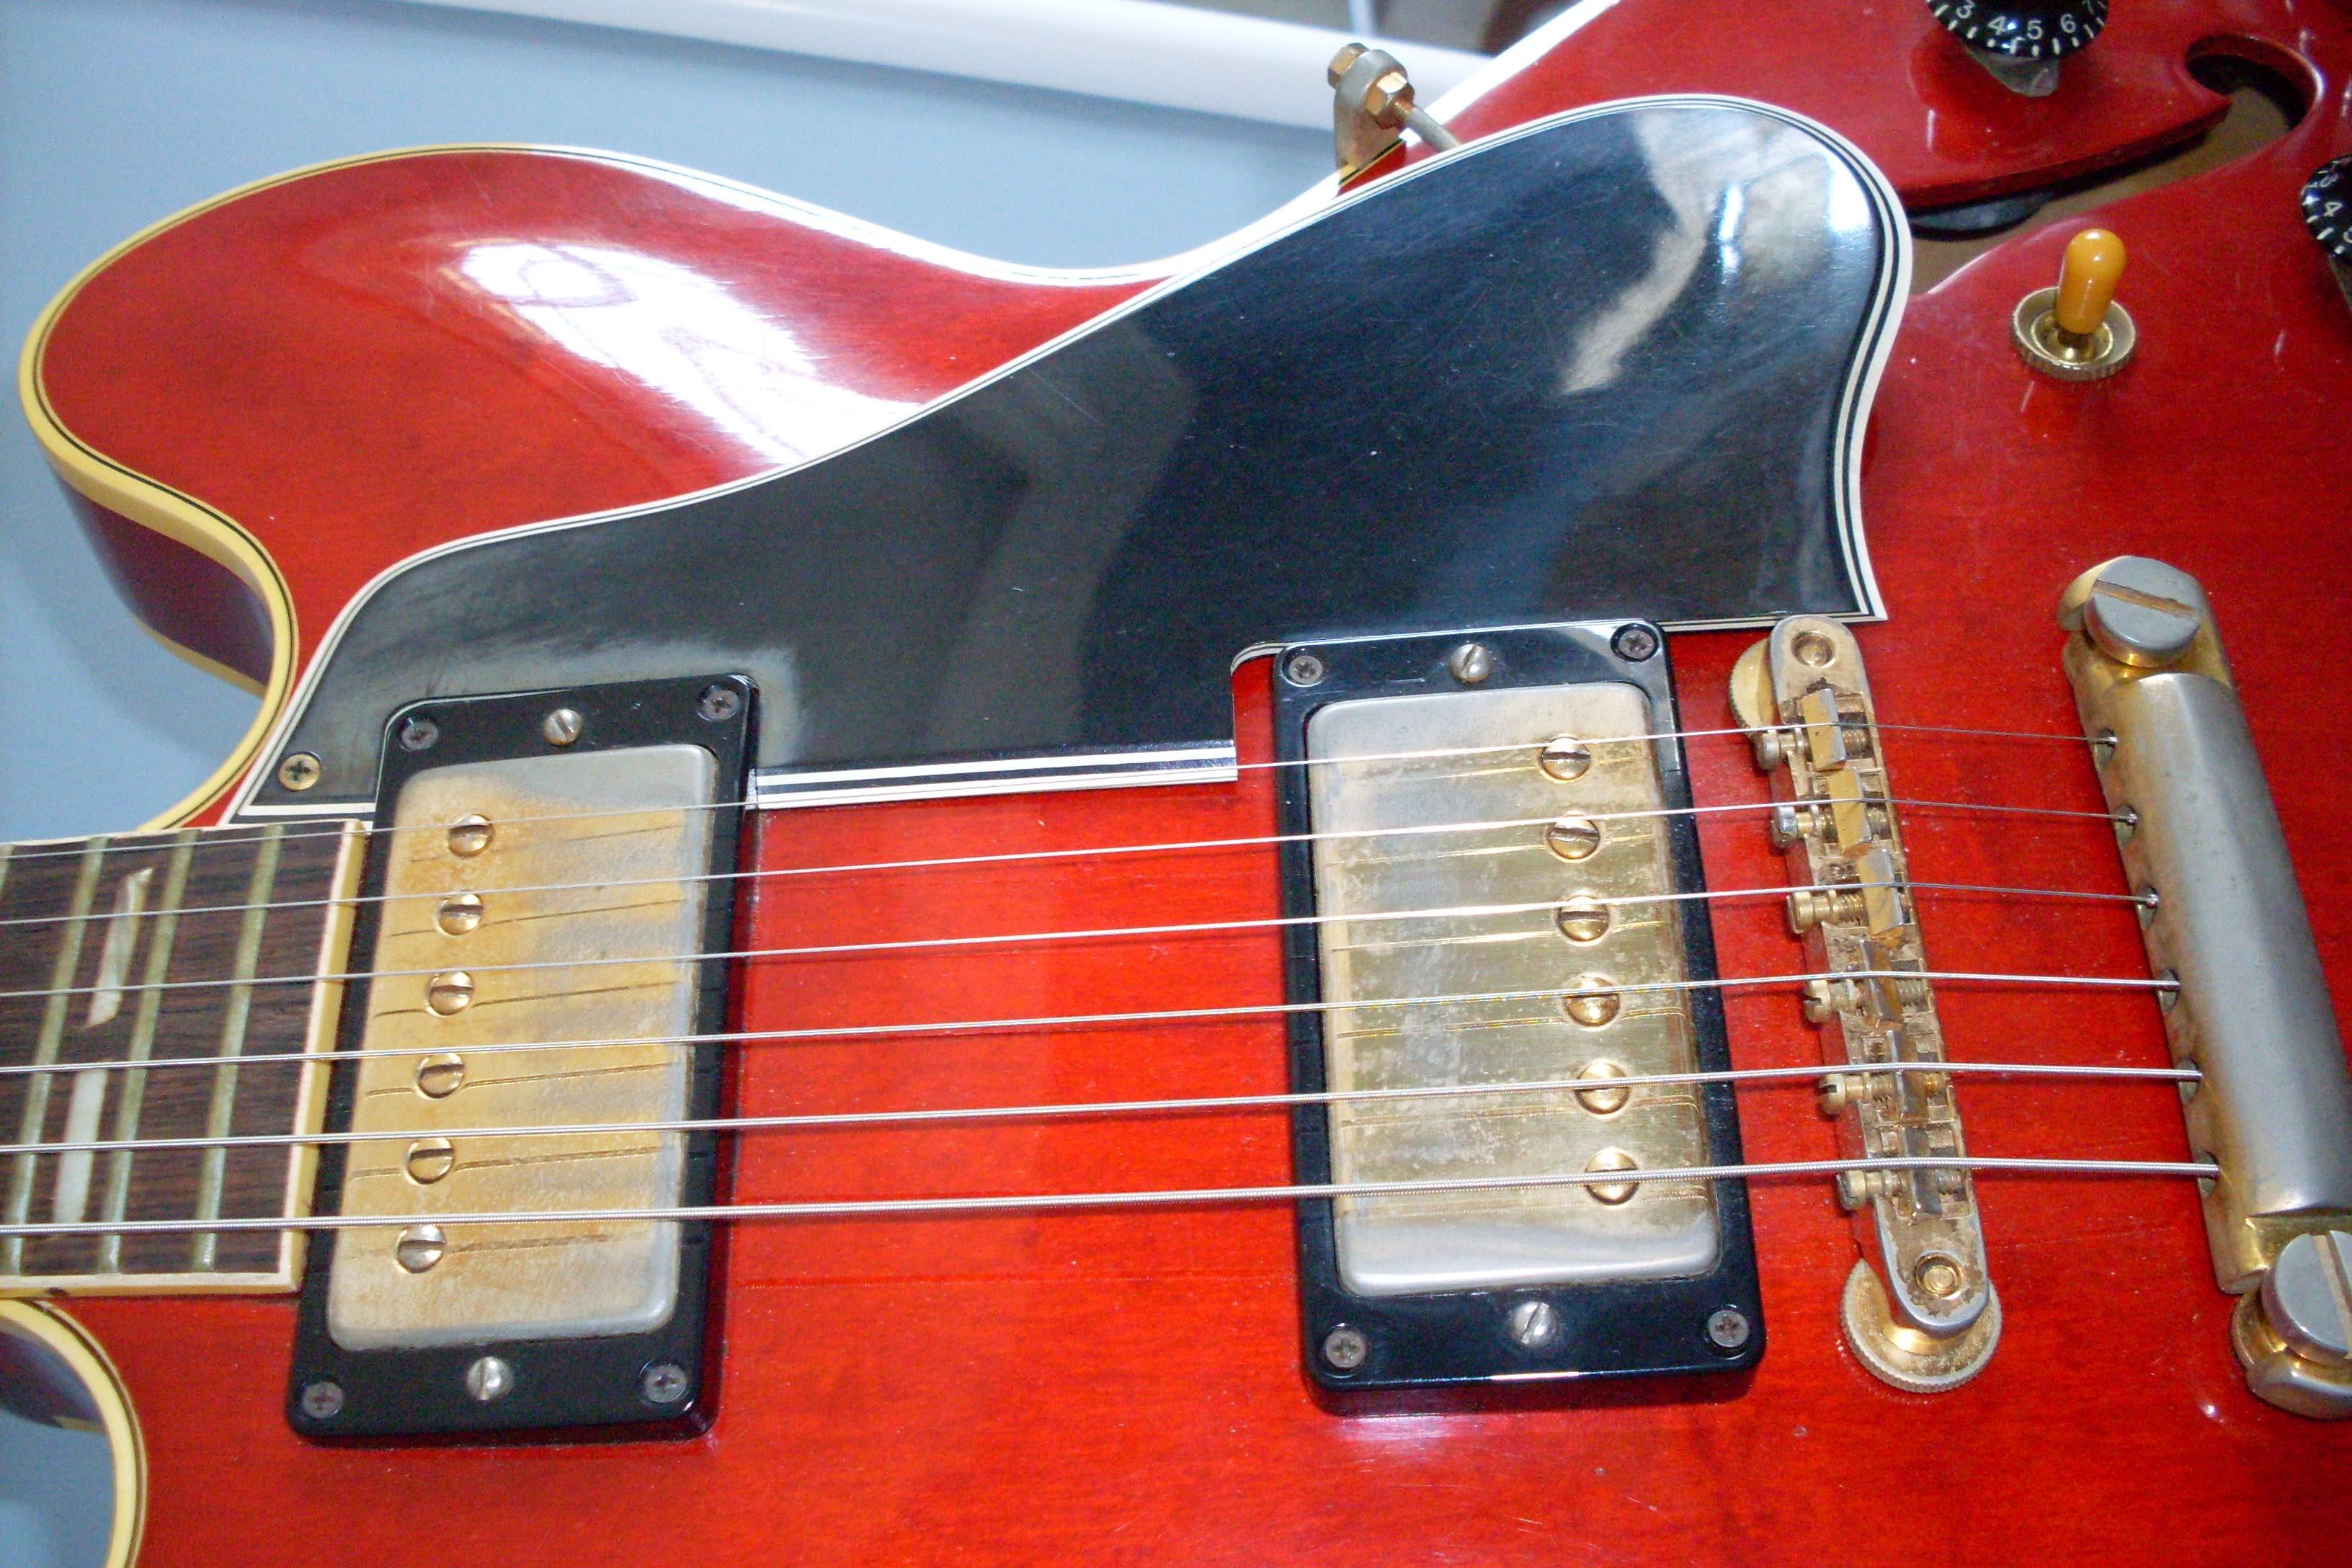 The Gibson ES-335 » Blog Archive » You Set 'em Up Part 1